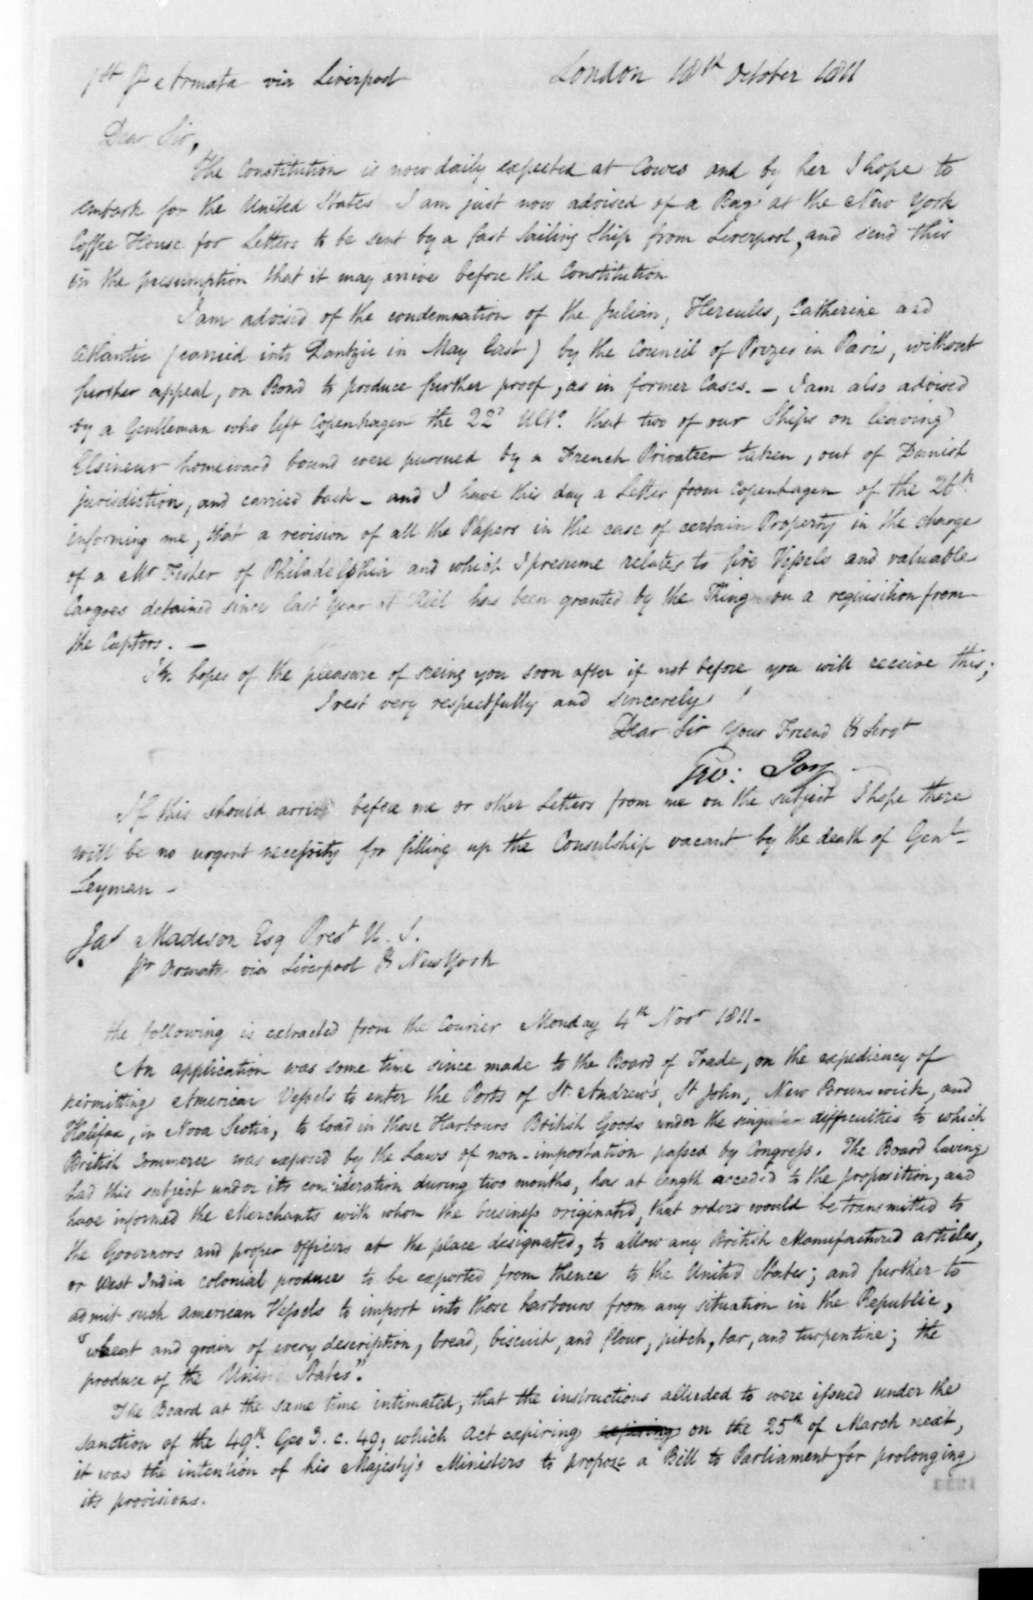 George Joy to James Madison, October 18, 1811.